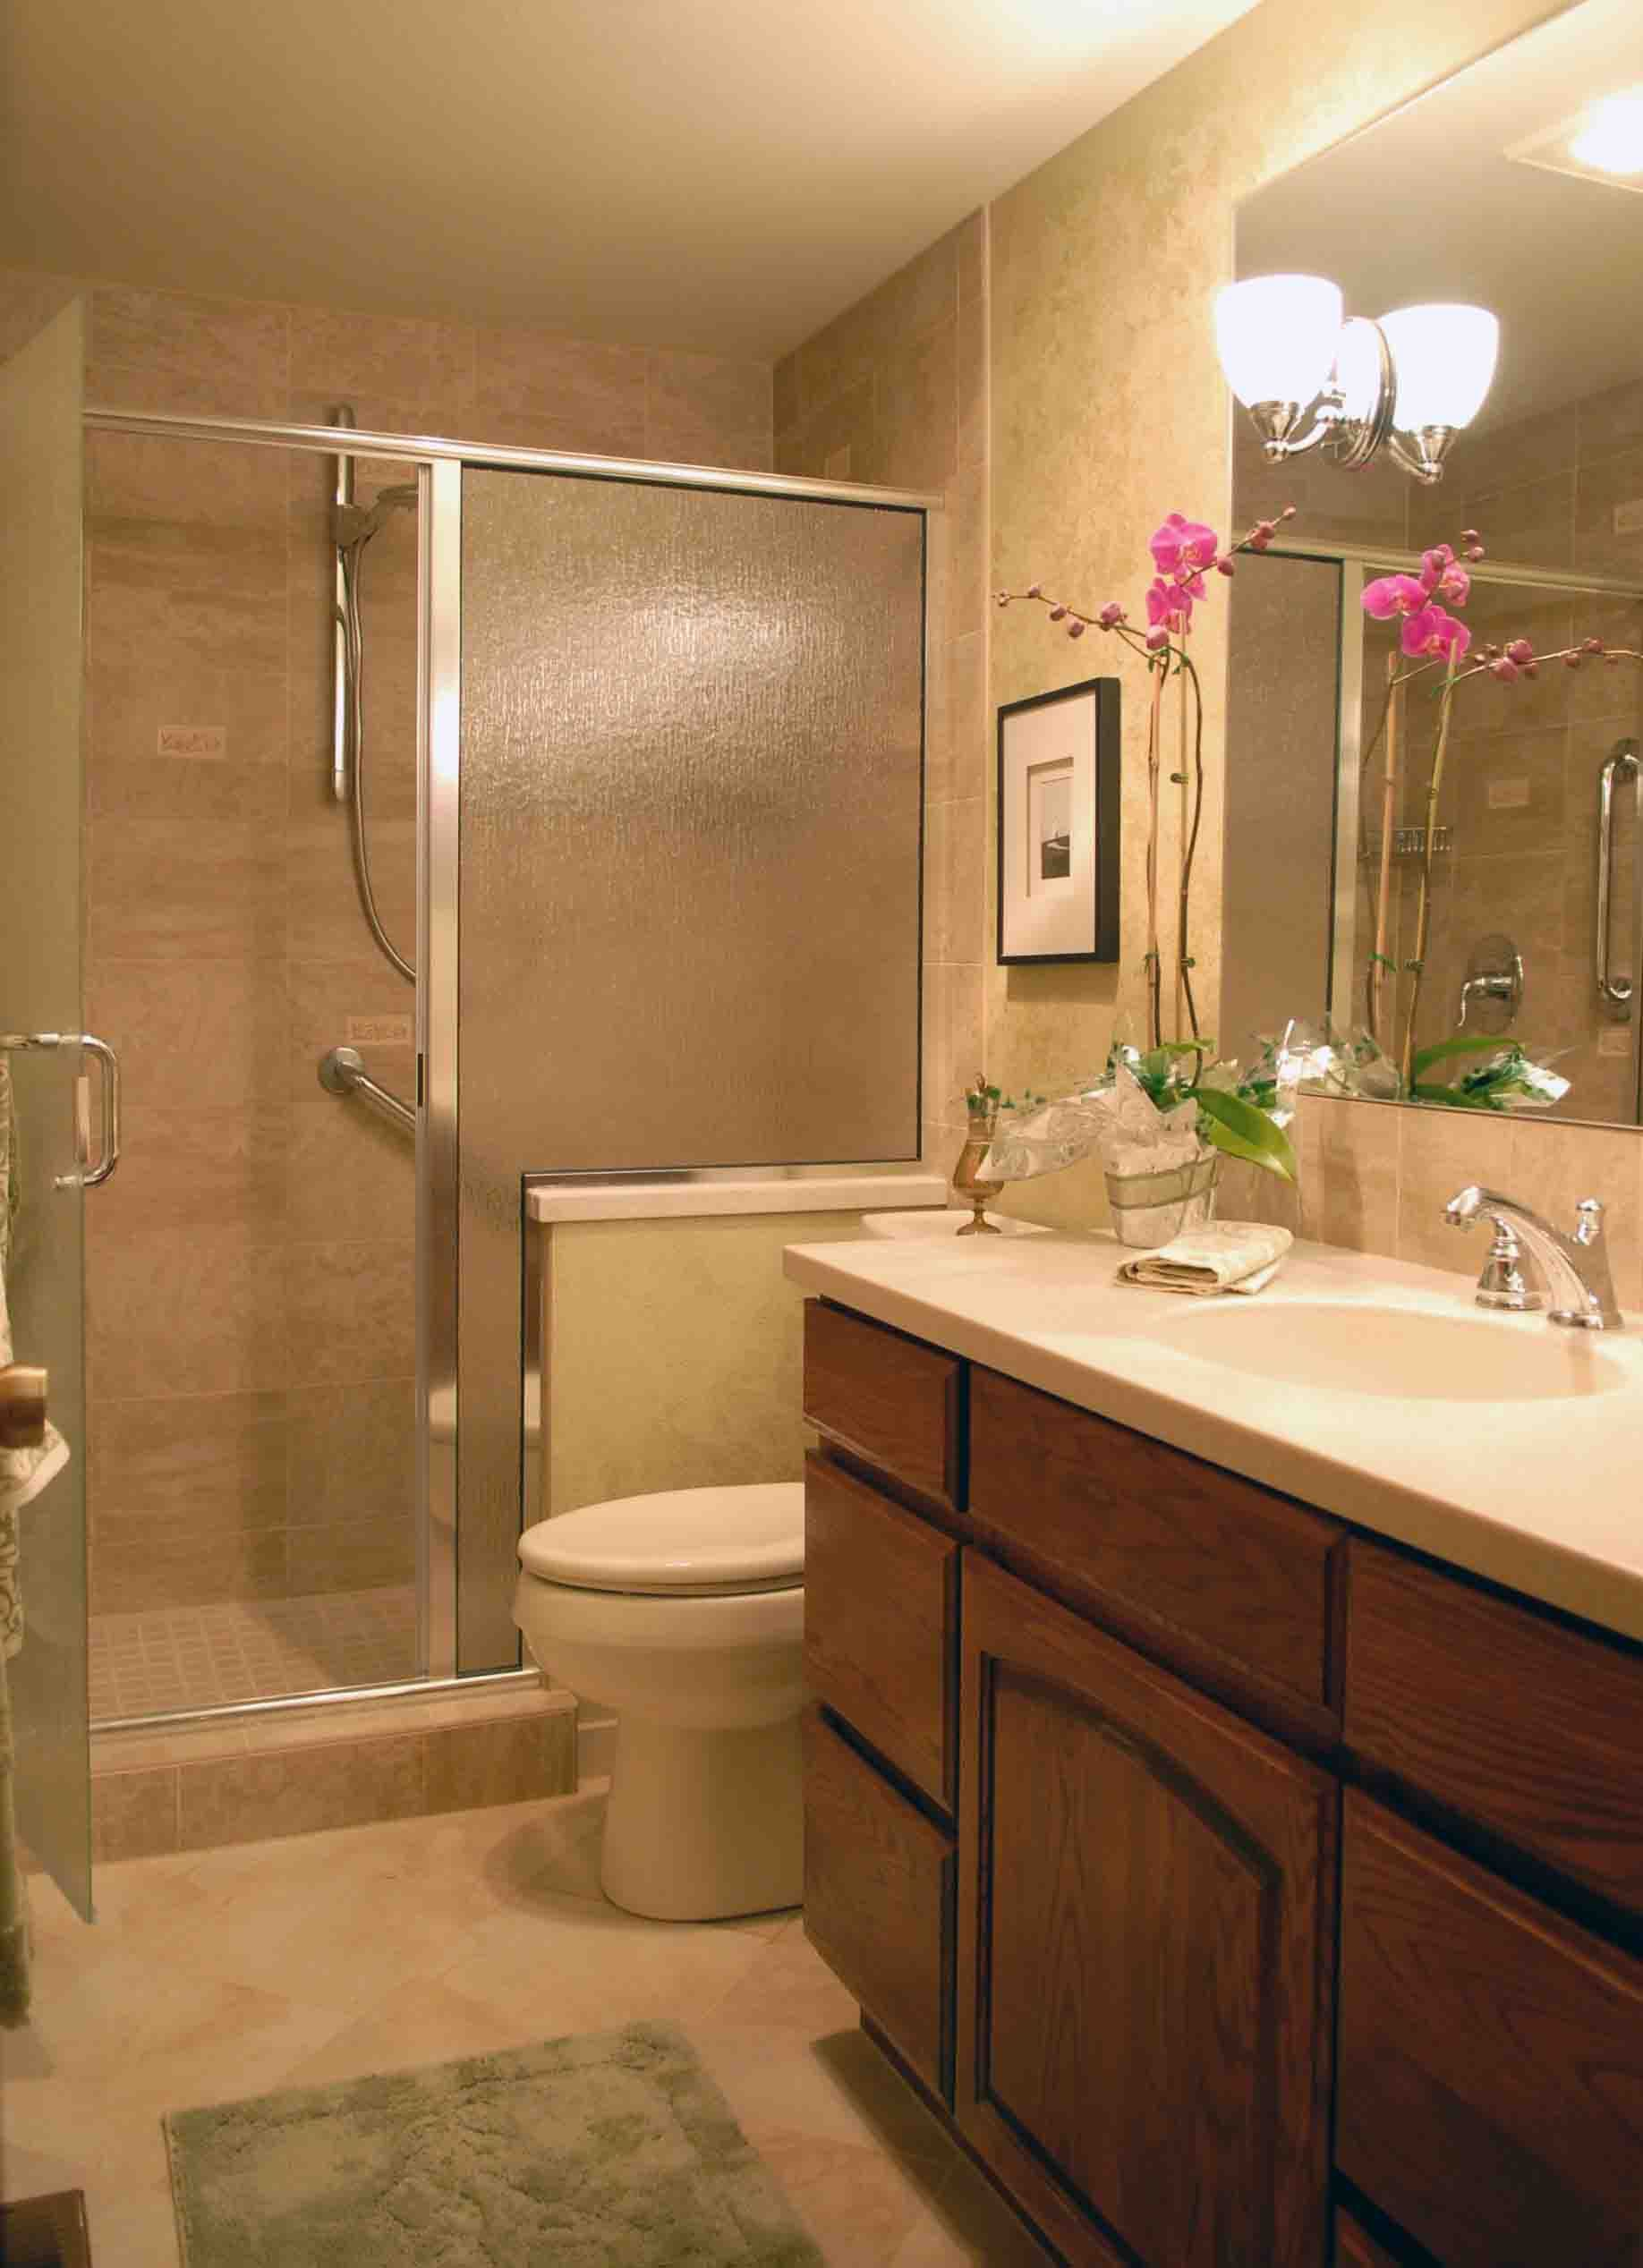 Bathroom remodel mirror ideas | ideas | Pinterest | Small bathroom ...